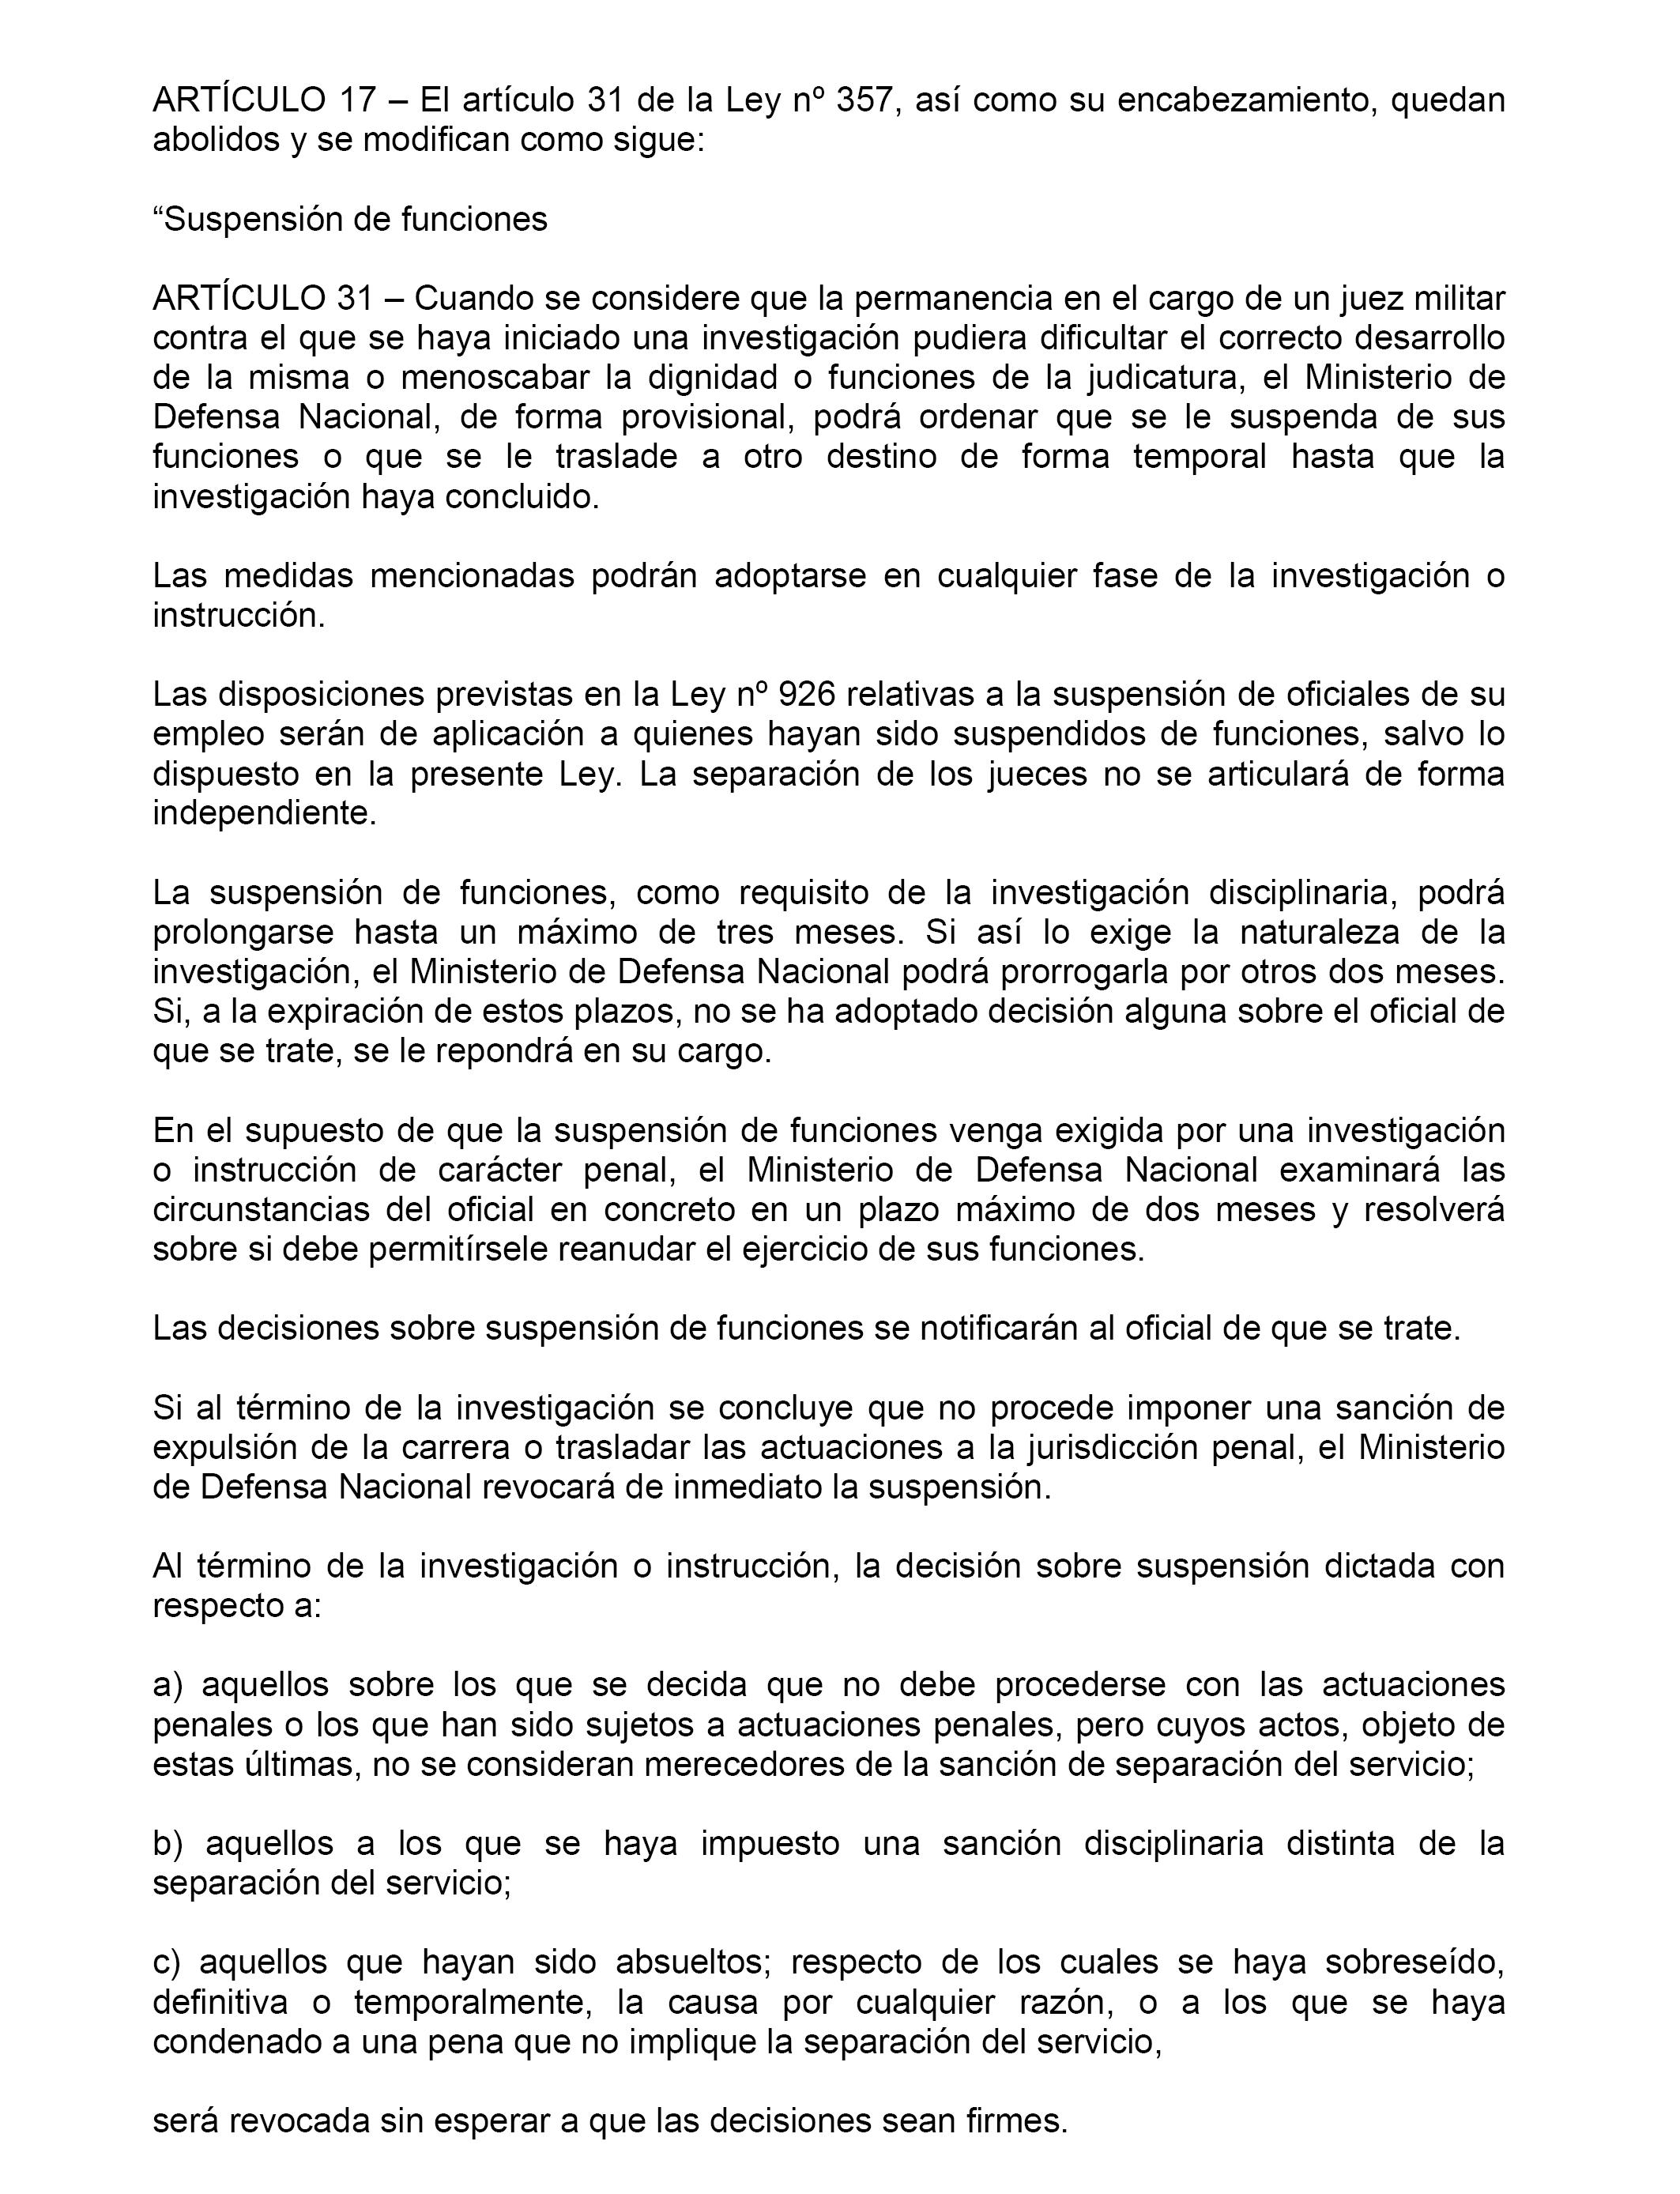 BOE.es - Documento BOE-A-2016-10027